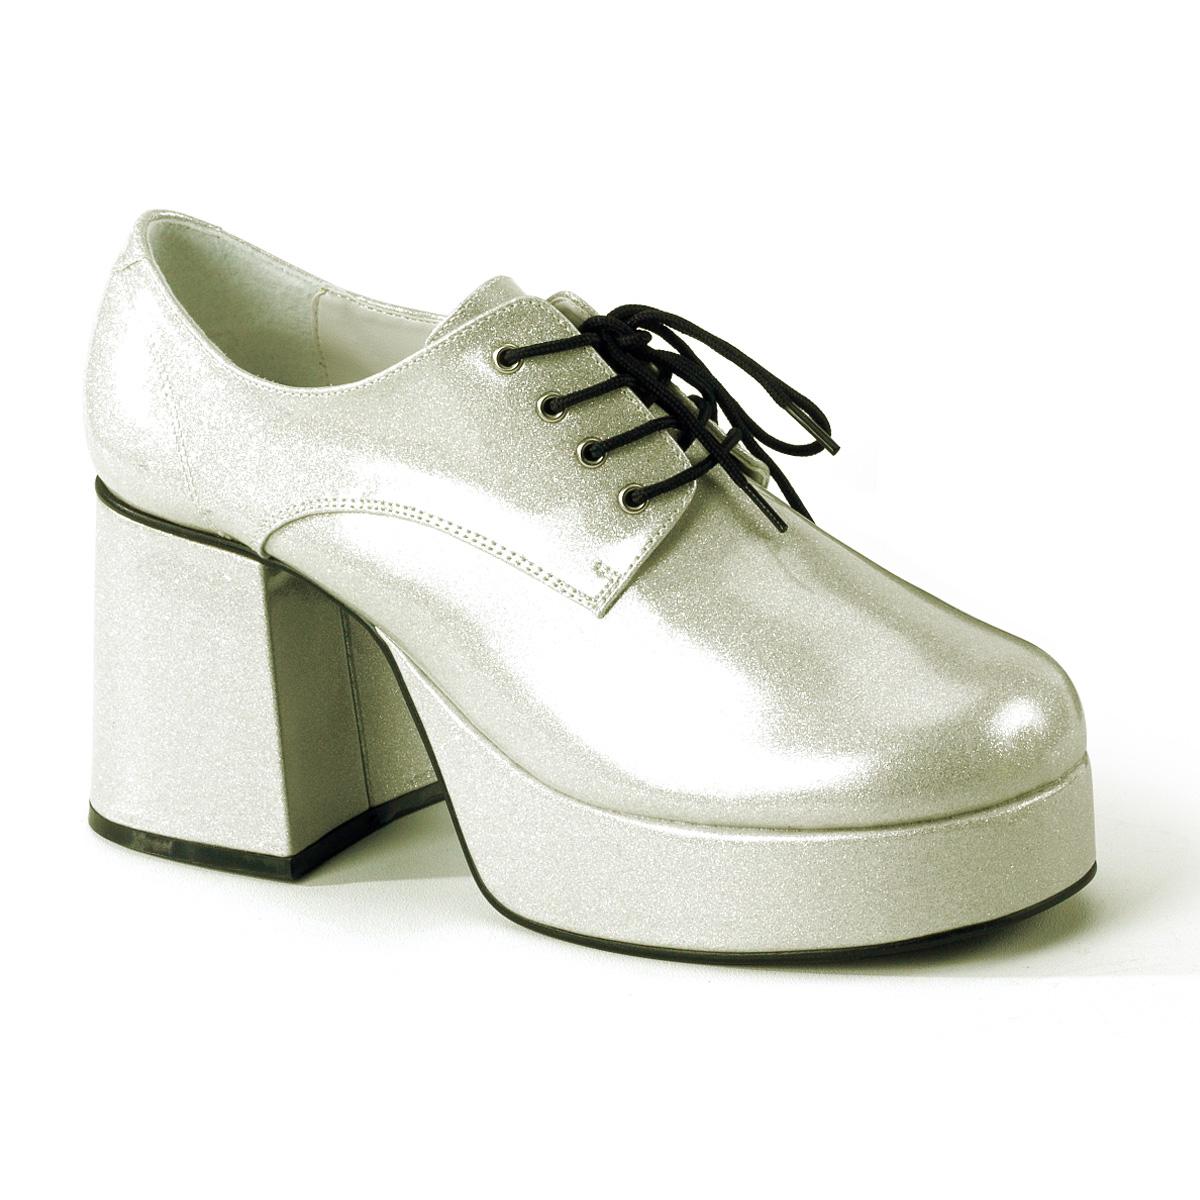 Men Platform Shoes JAZZ-02G - Glitter